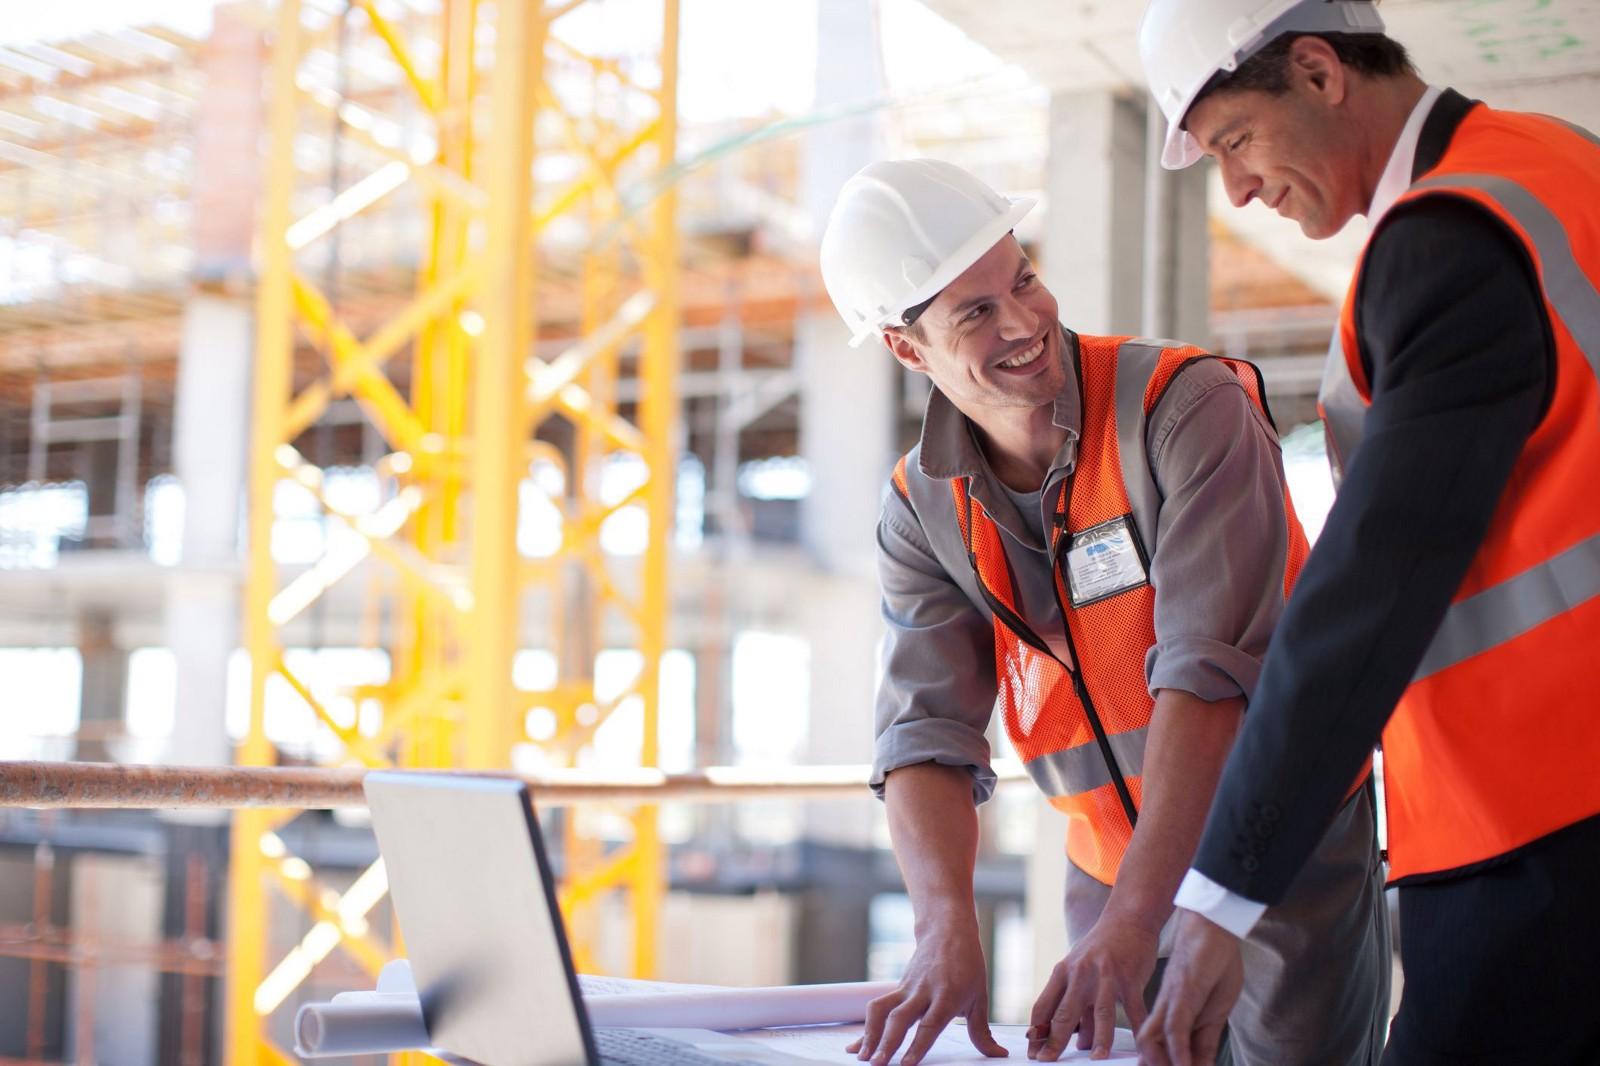 Building Construction Companies in Dubai